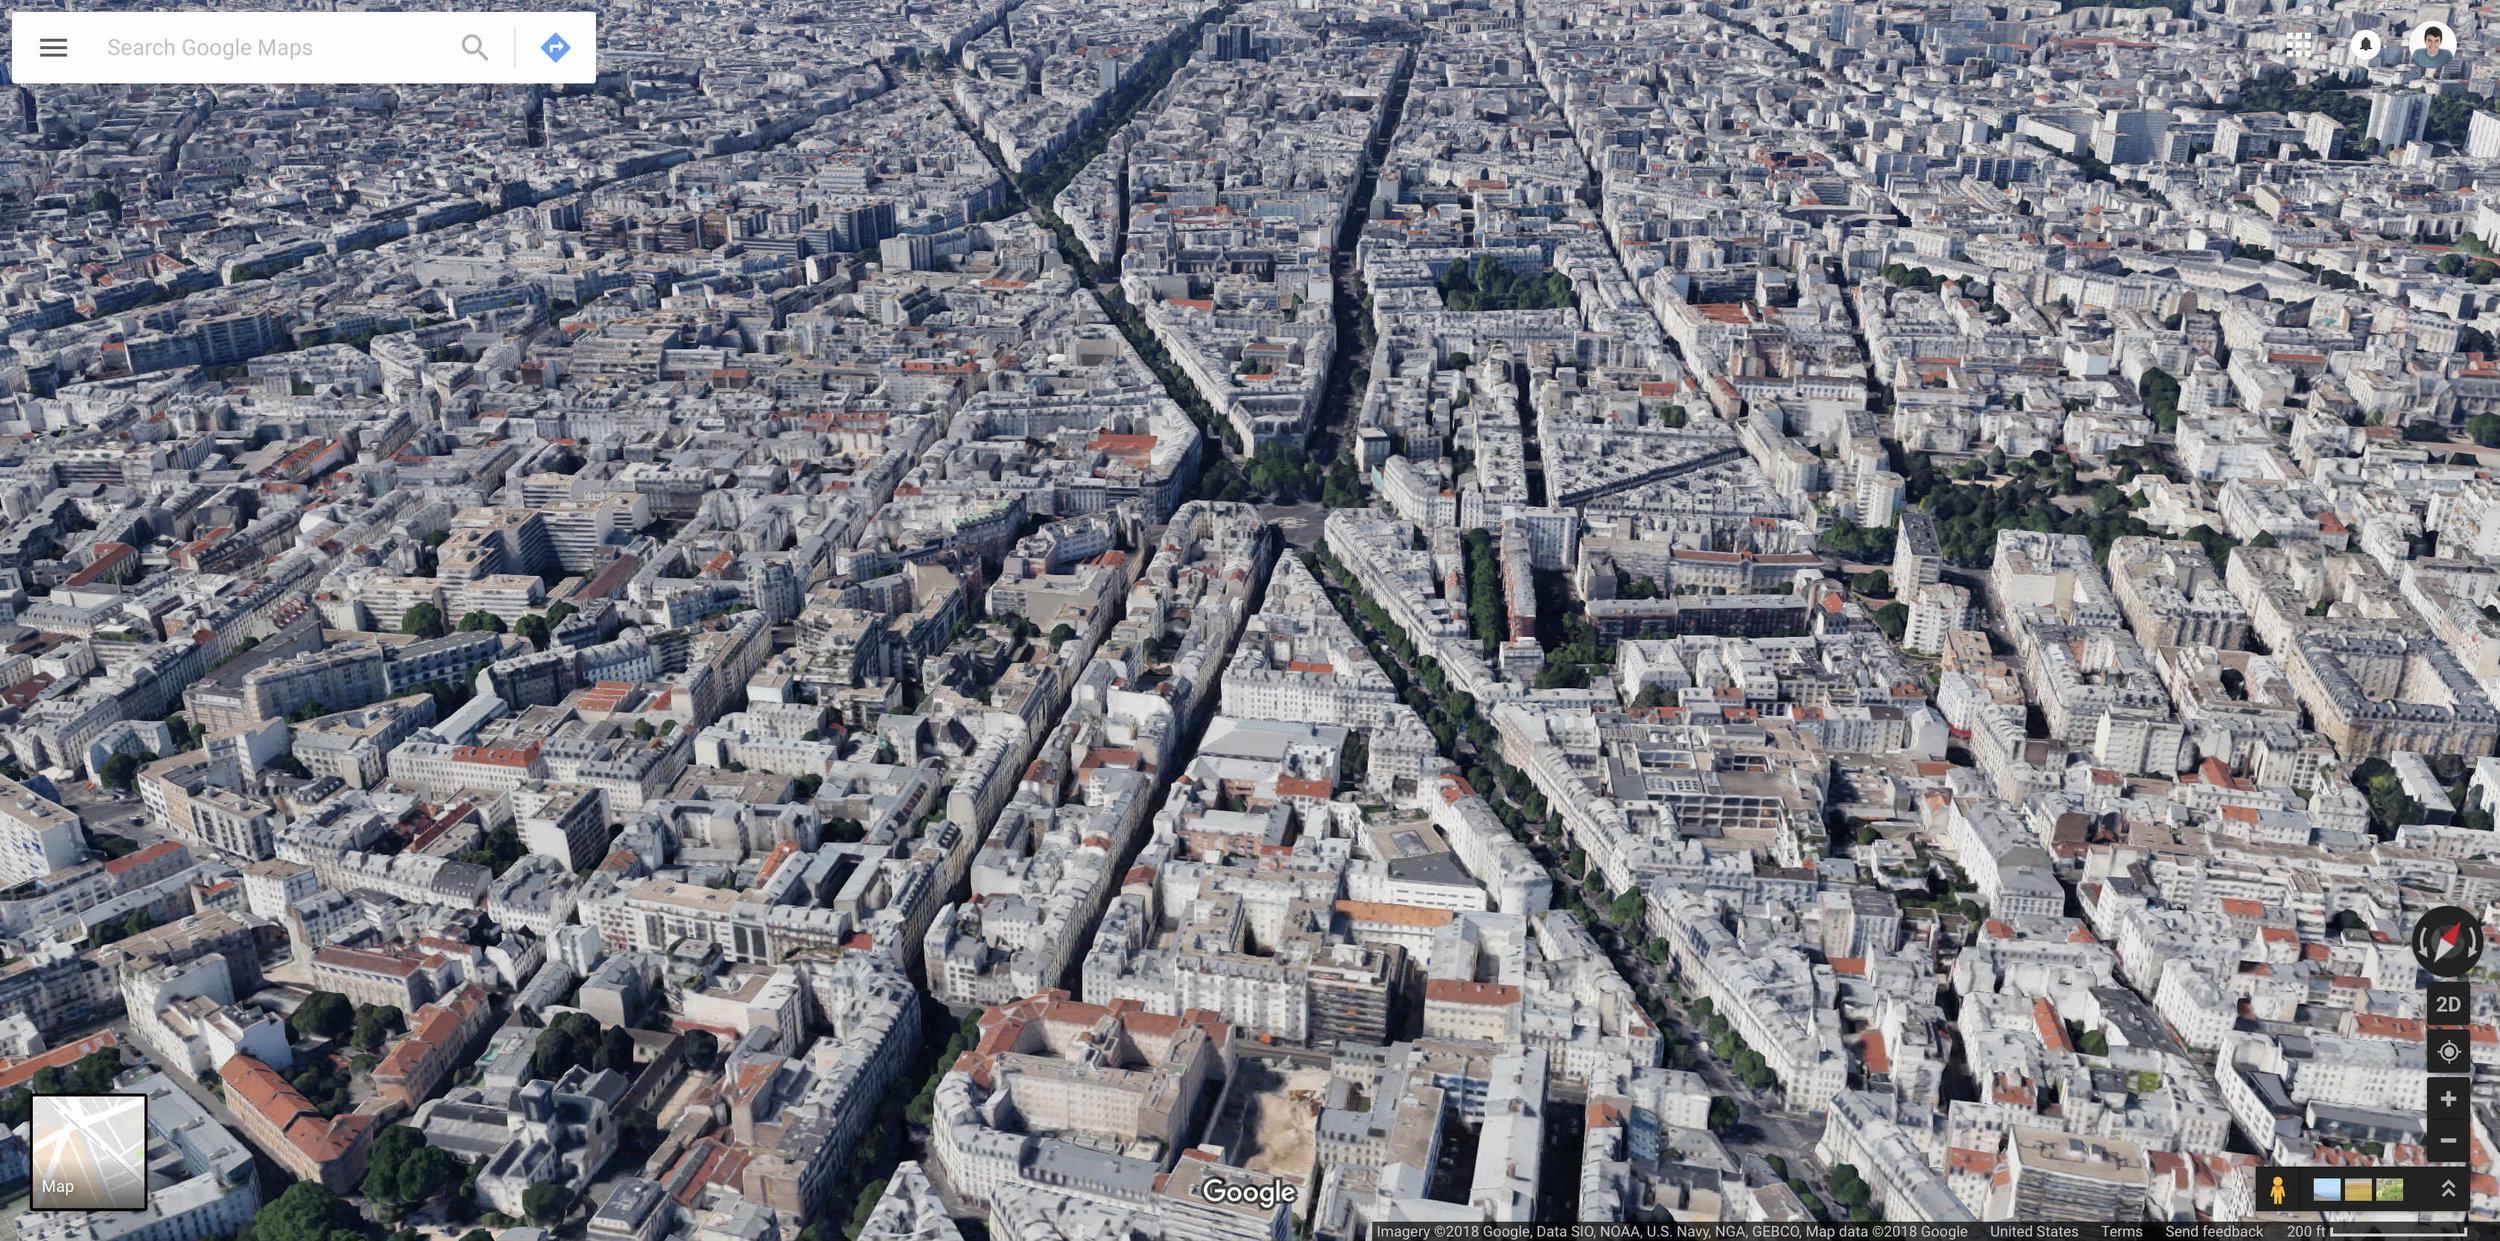 Aerial view of the 11th arrondissement of Paris